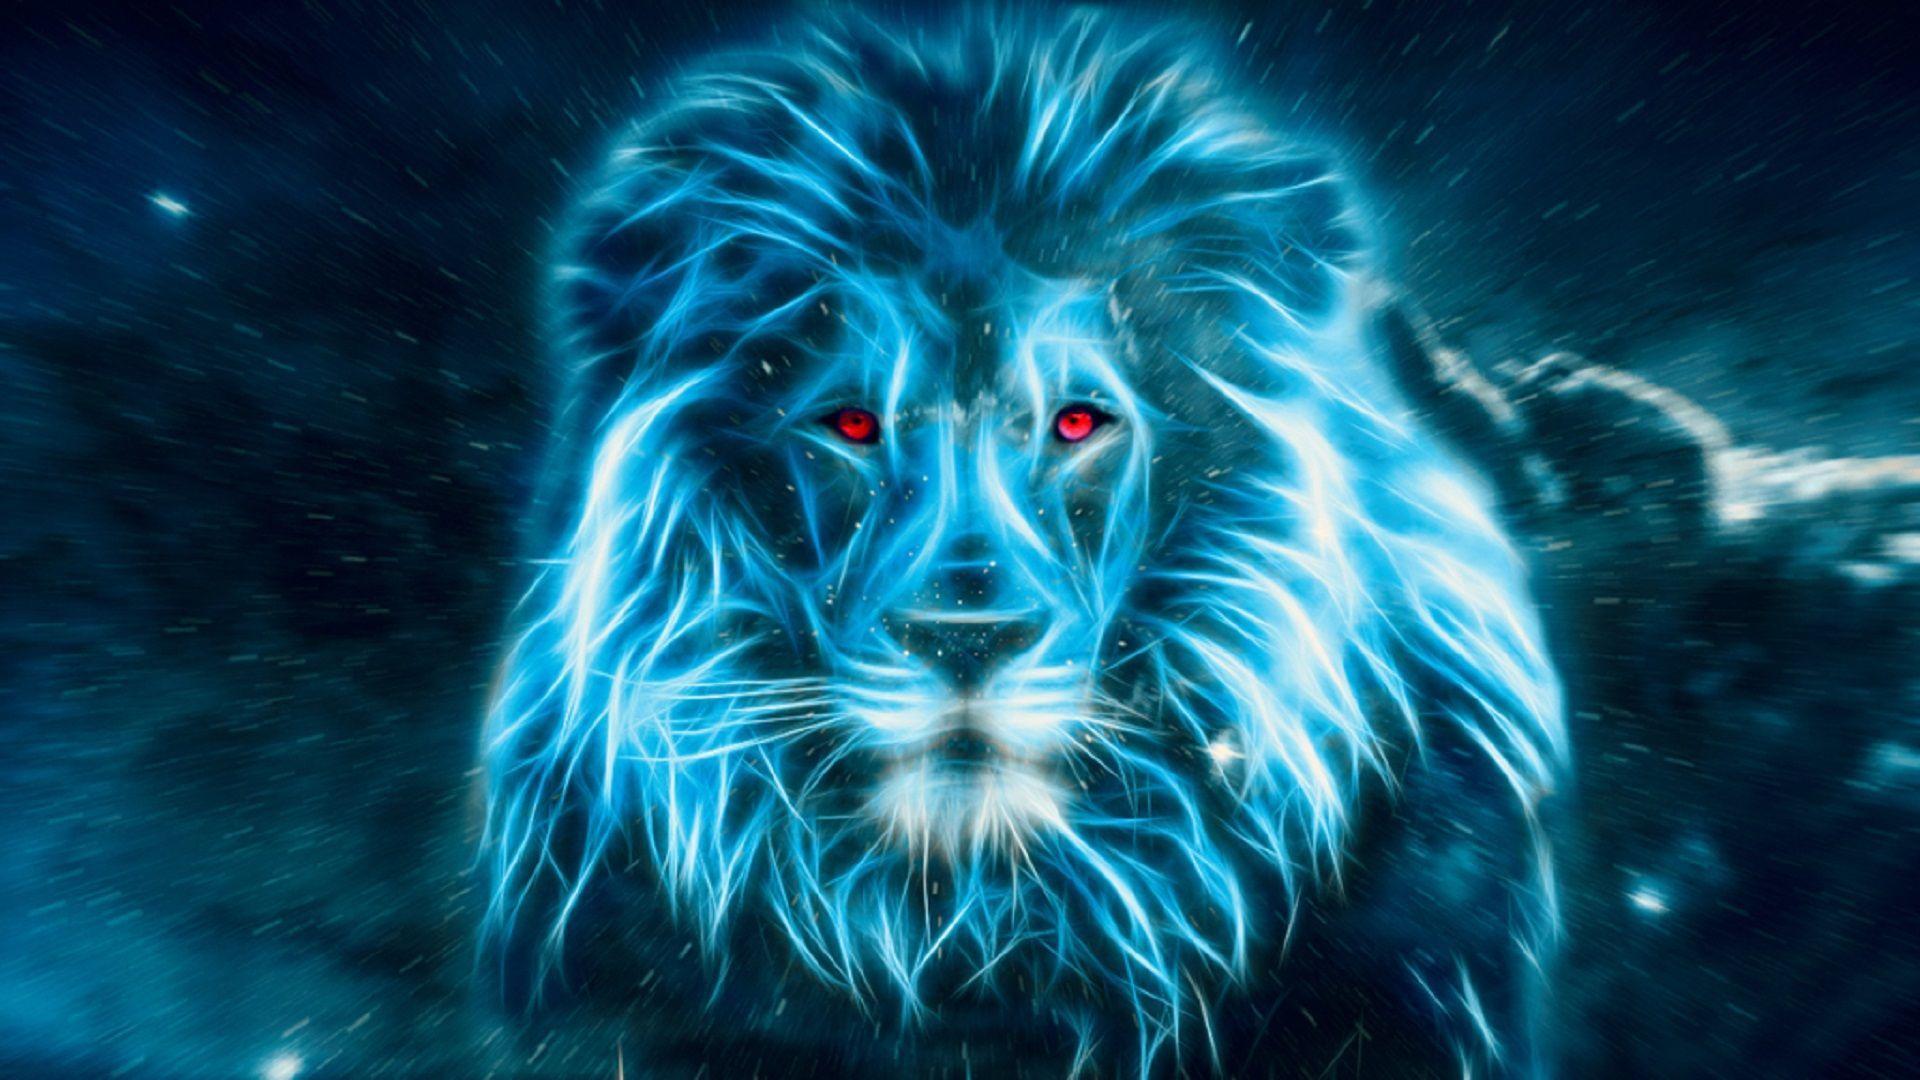 Blue Lion Wallpapers Top Free Blue Lion Backgrounds